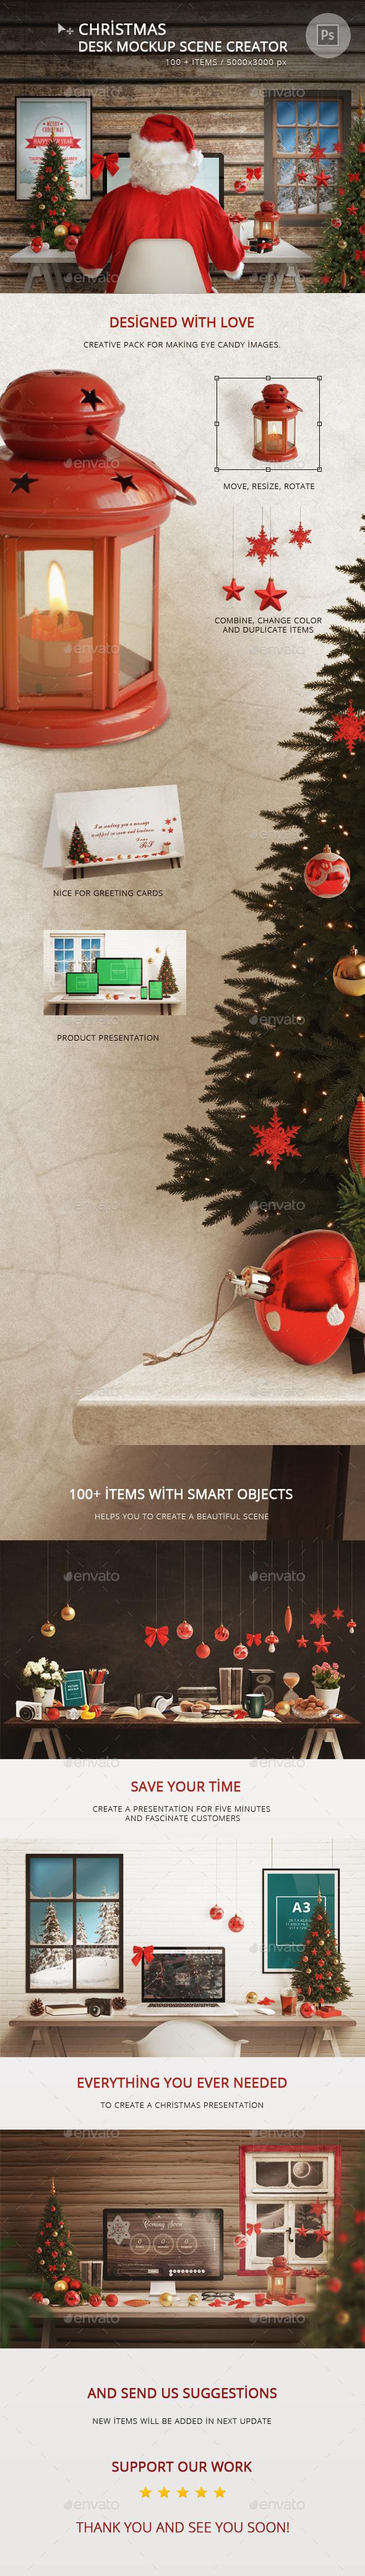 Christmas Desk Mockup Scene Creator - Hero Images Graphics